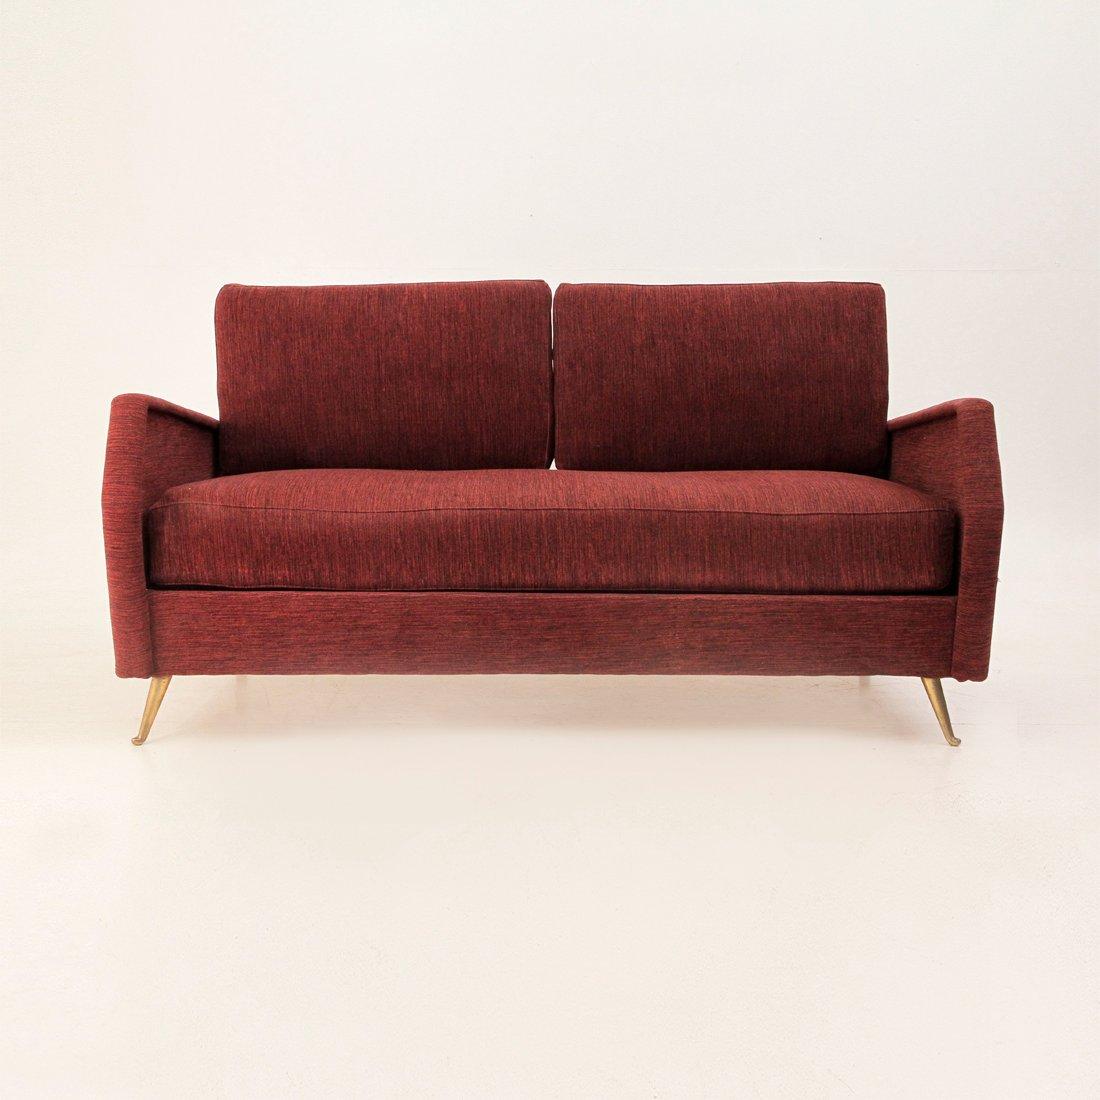 Mid Century Italian Sofa Bed 1950s For Sale At Pamono